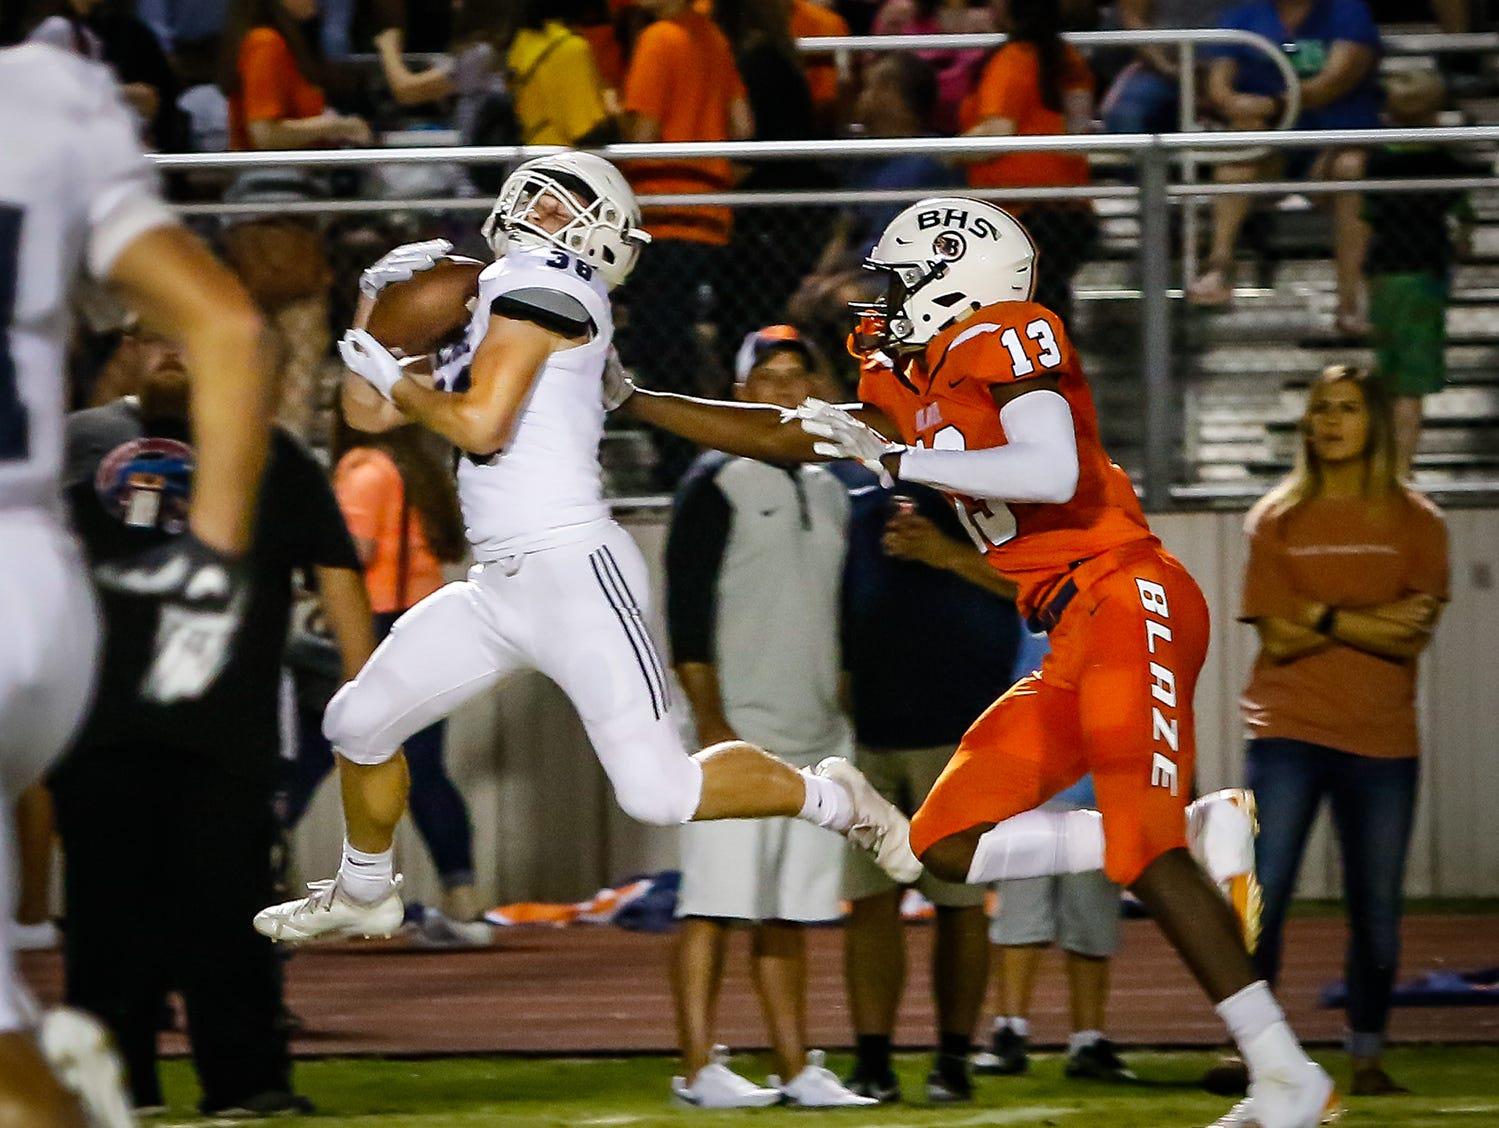 Siegel's Brandon Ricks intercepts a pass intended for Trey Knox.